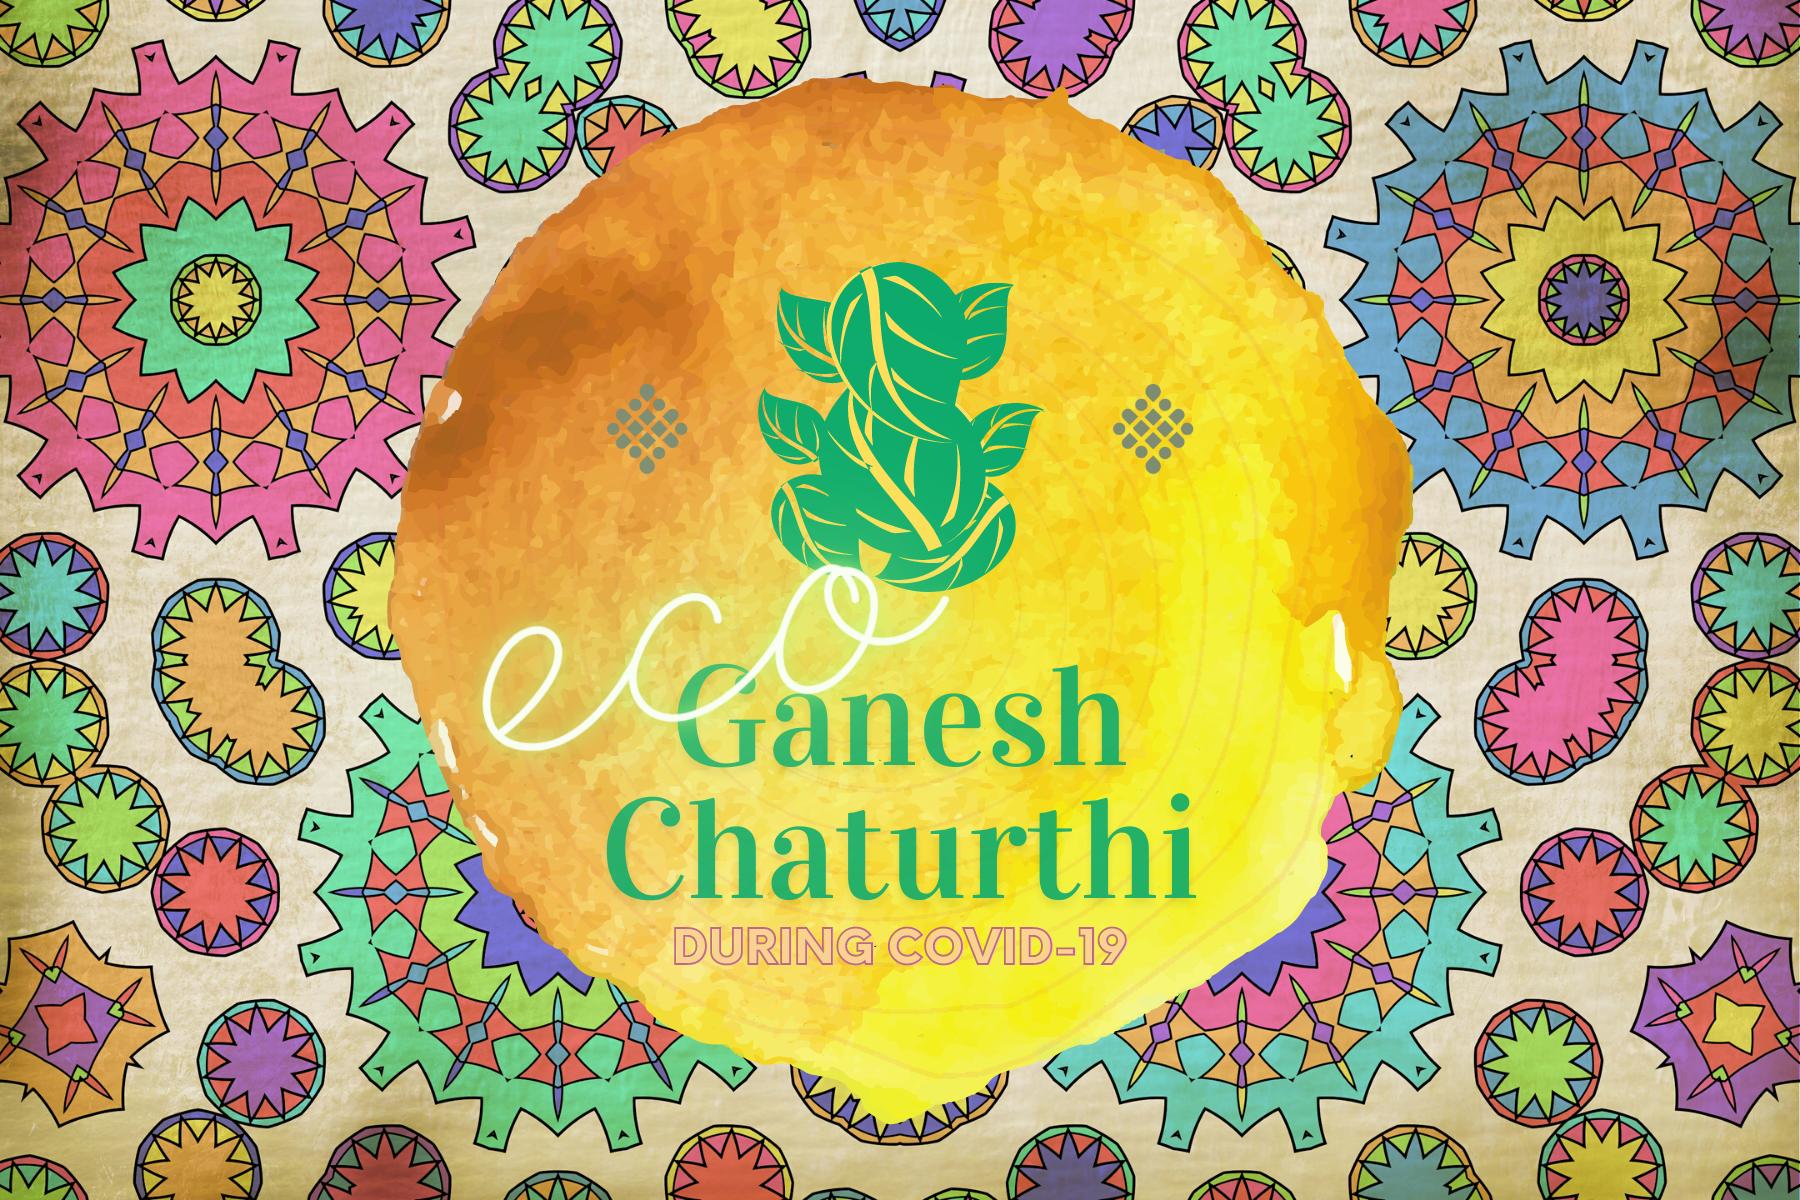 Let's Celebrate Eco-friendly Ganesha Festival duringCOVID-19